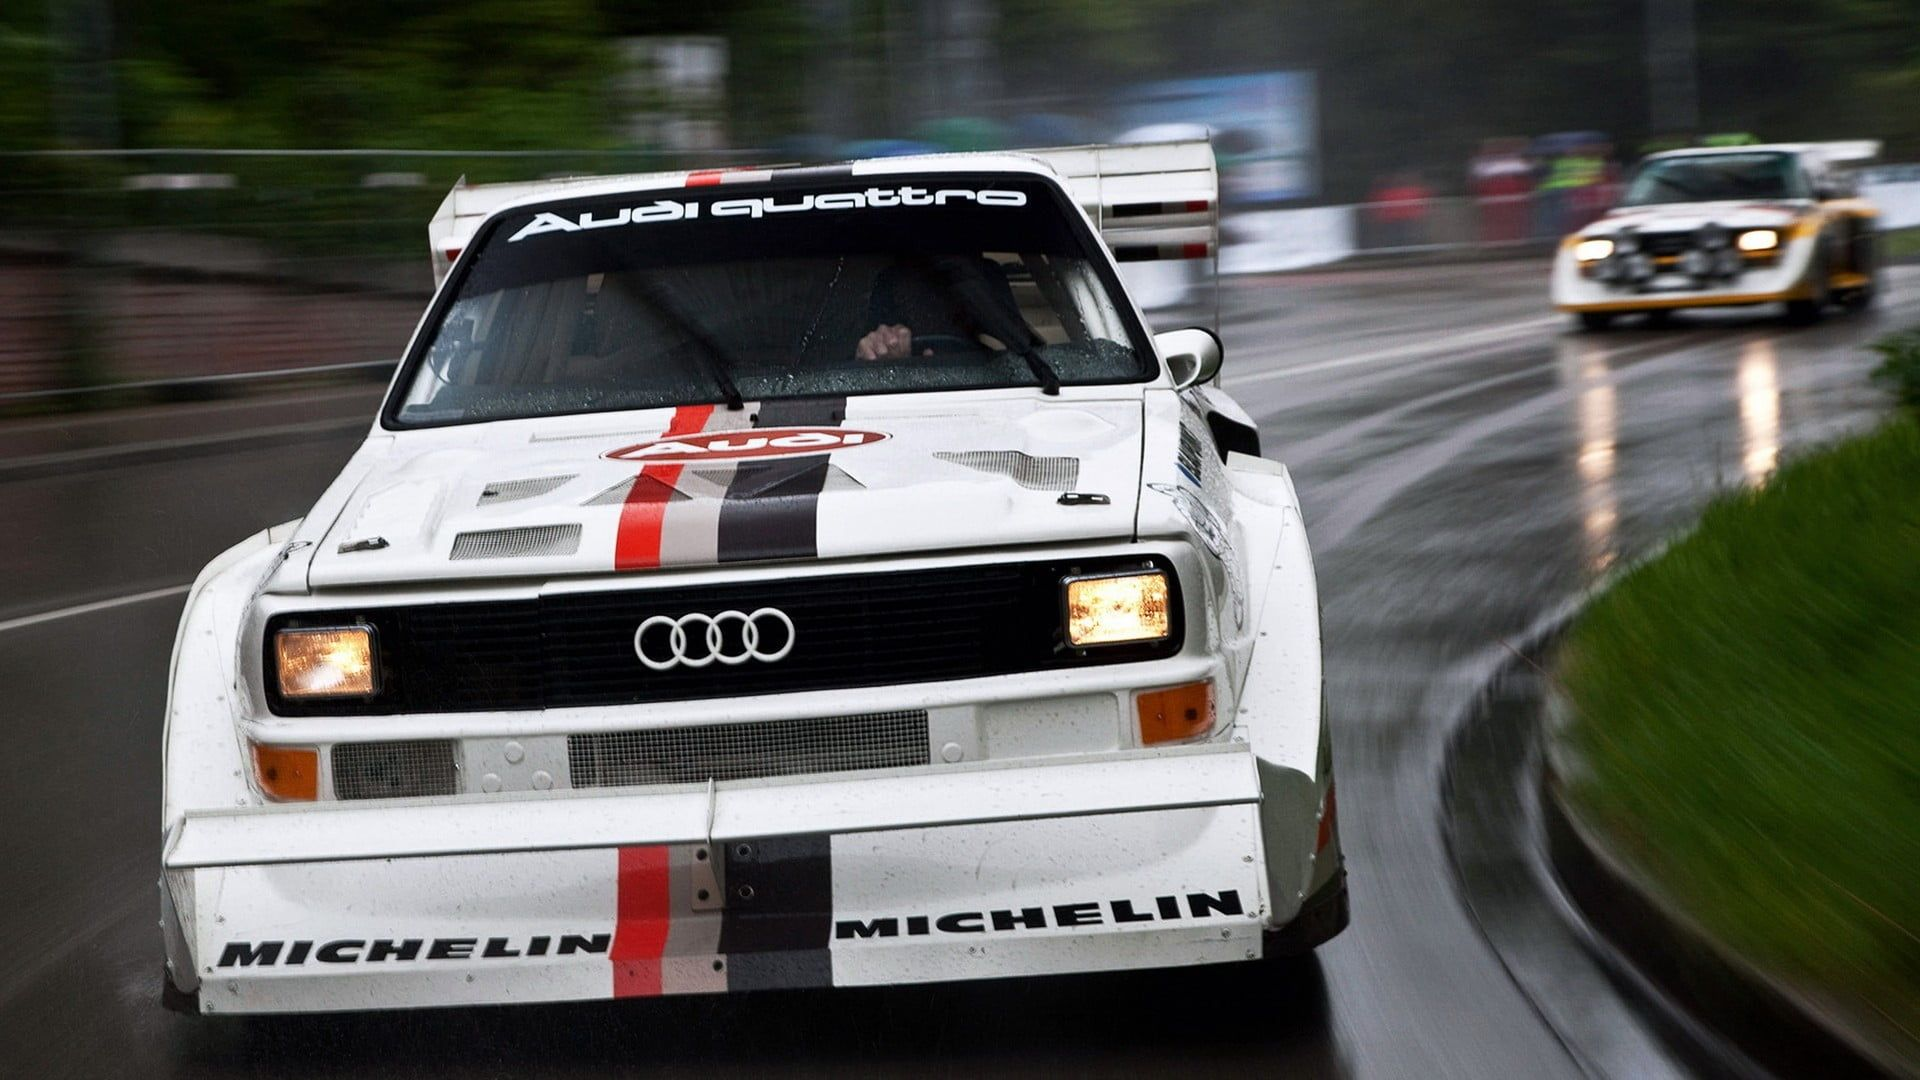 White Audi Vehicle Audi Audi Quattro Car Rally Cars Sports Car Old Car Audi Sport Quattro S1 1080p Wallpaper Hdwallpaper Des Audi Quattro Audi Sport Audi